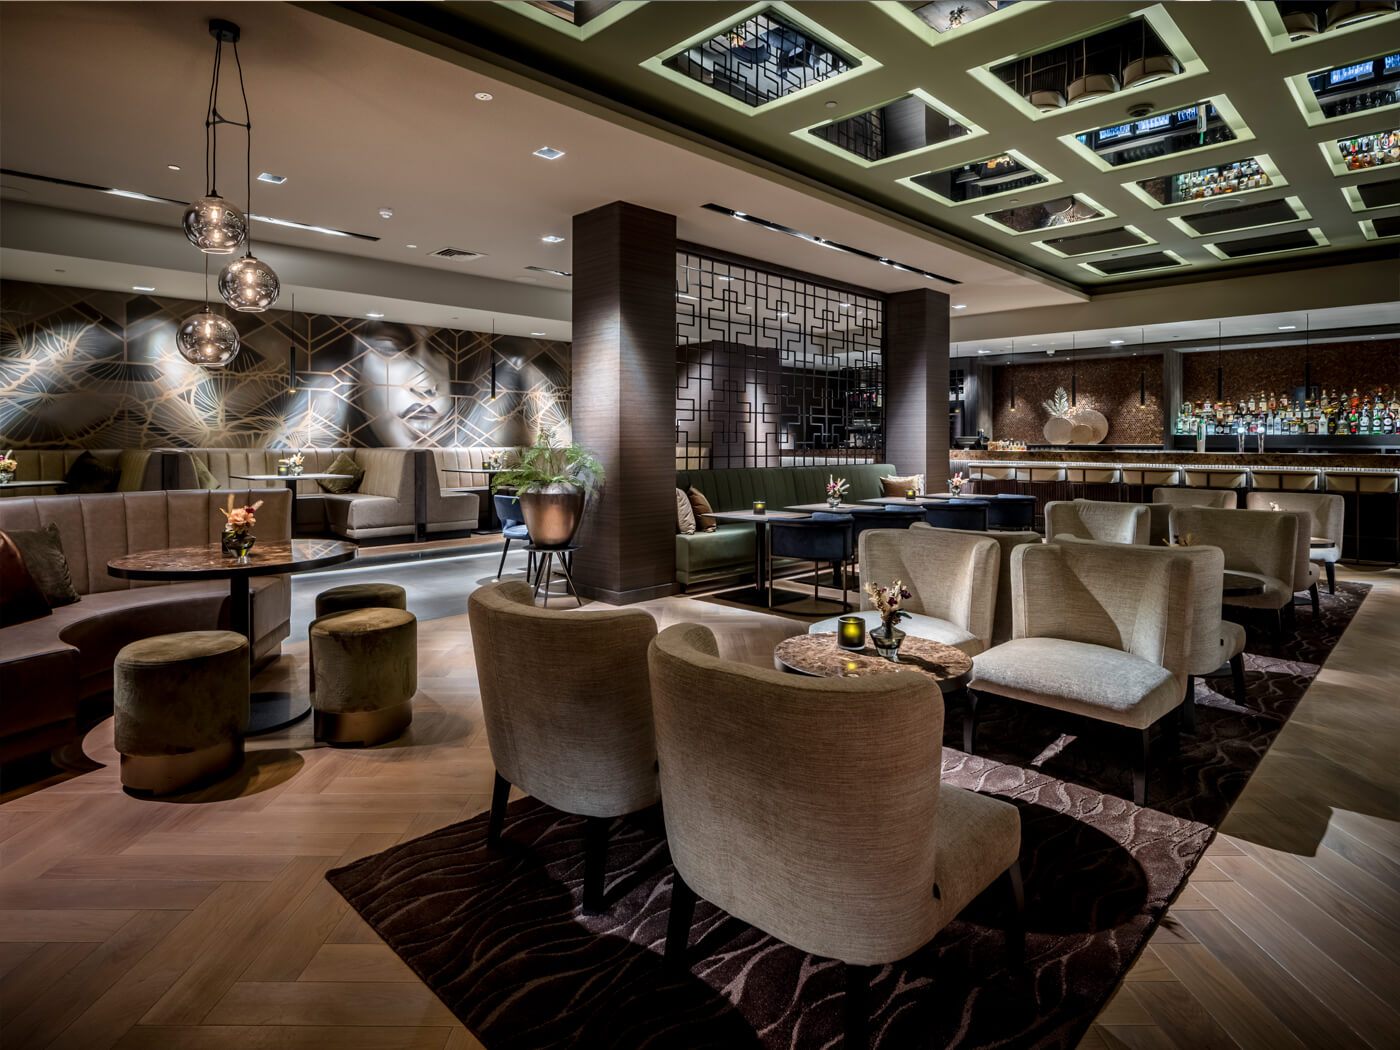 Hotel design Van der Valk Dordrecht